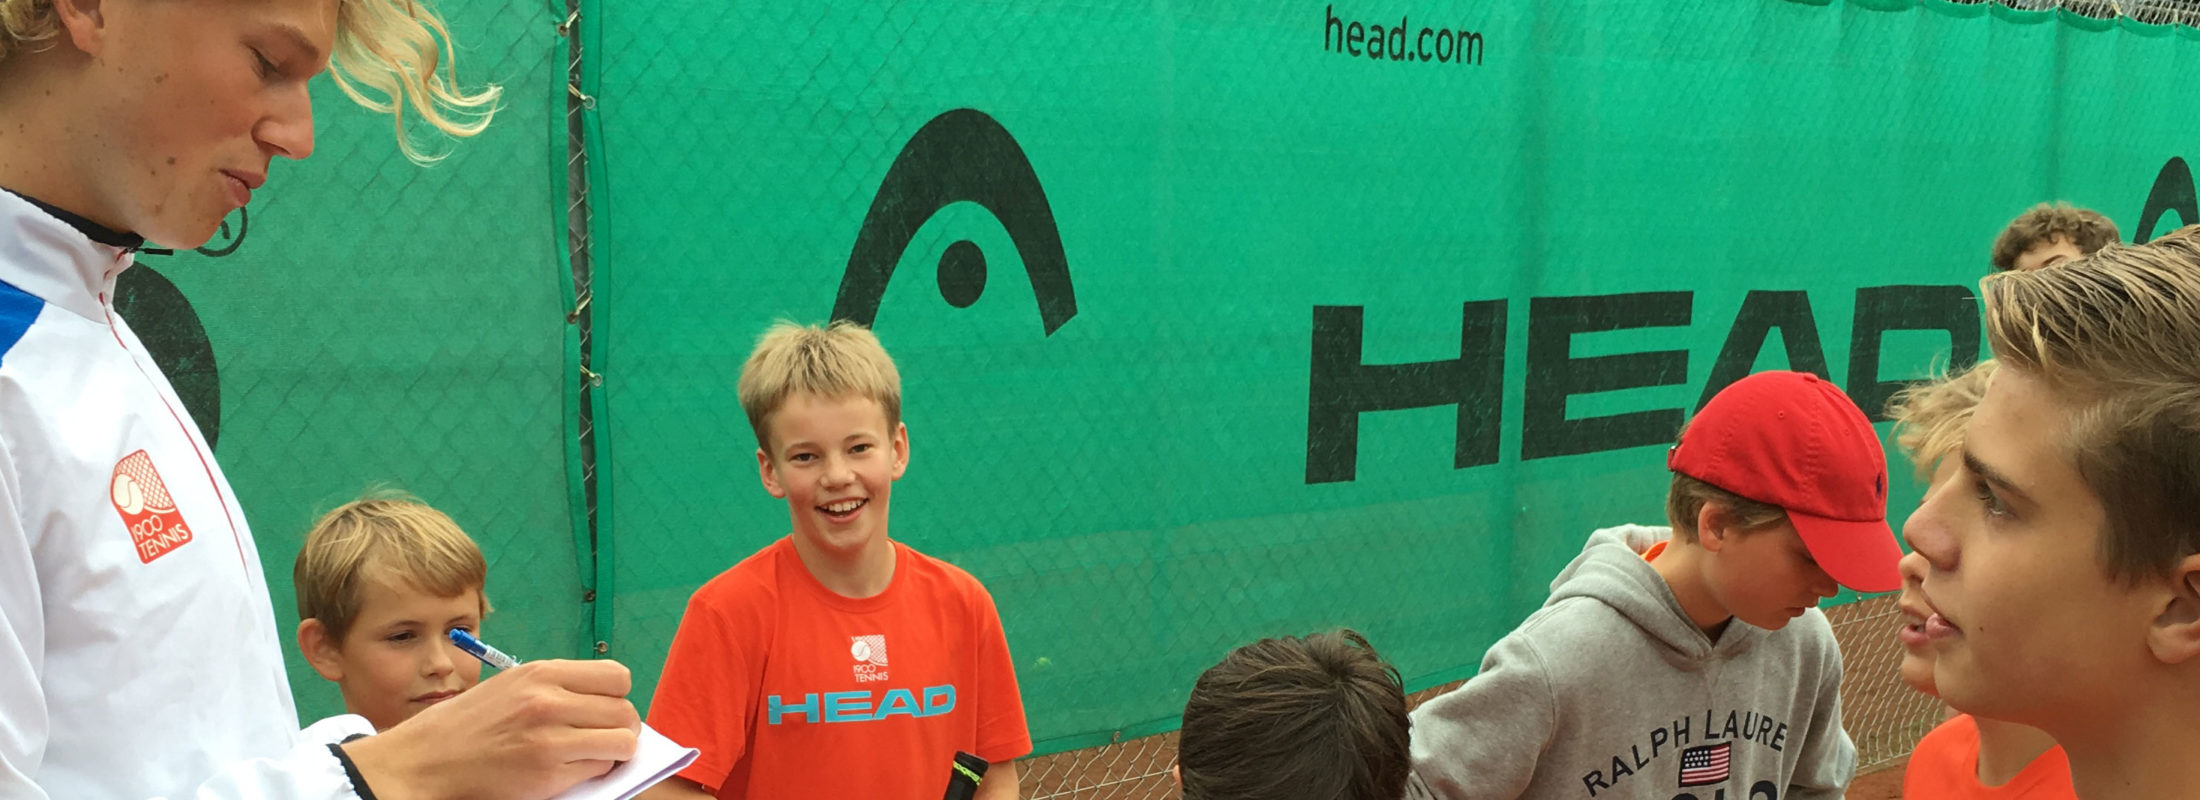 Tennisskole for børn